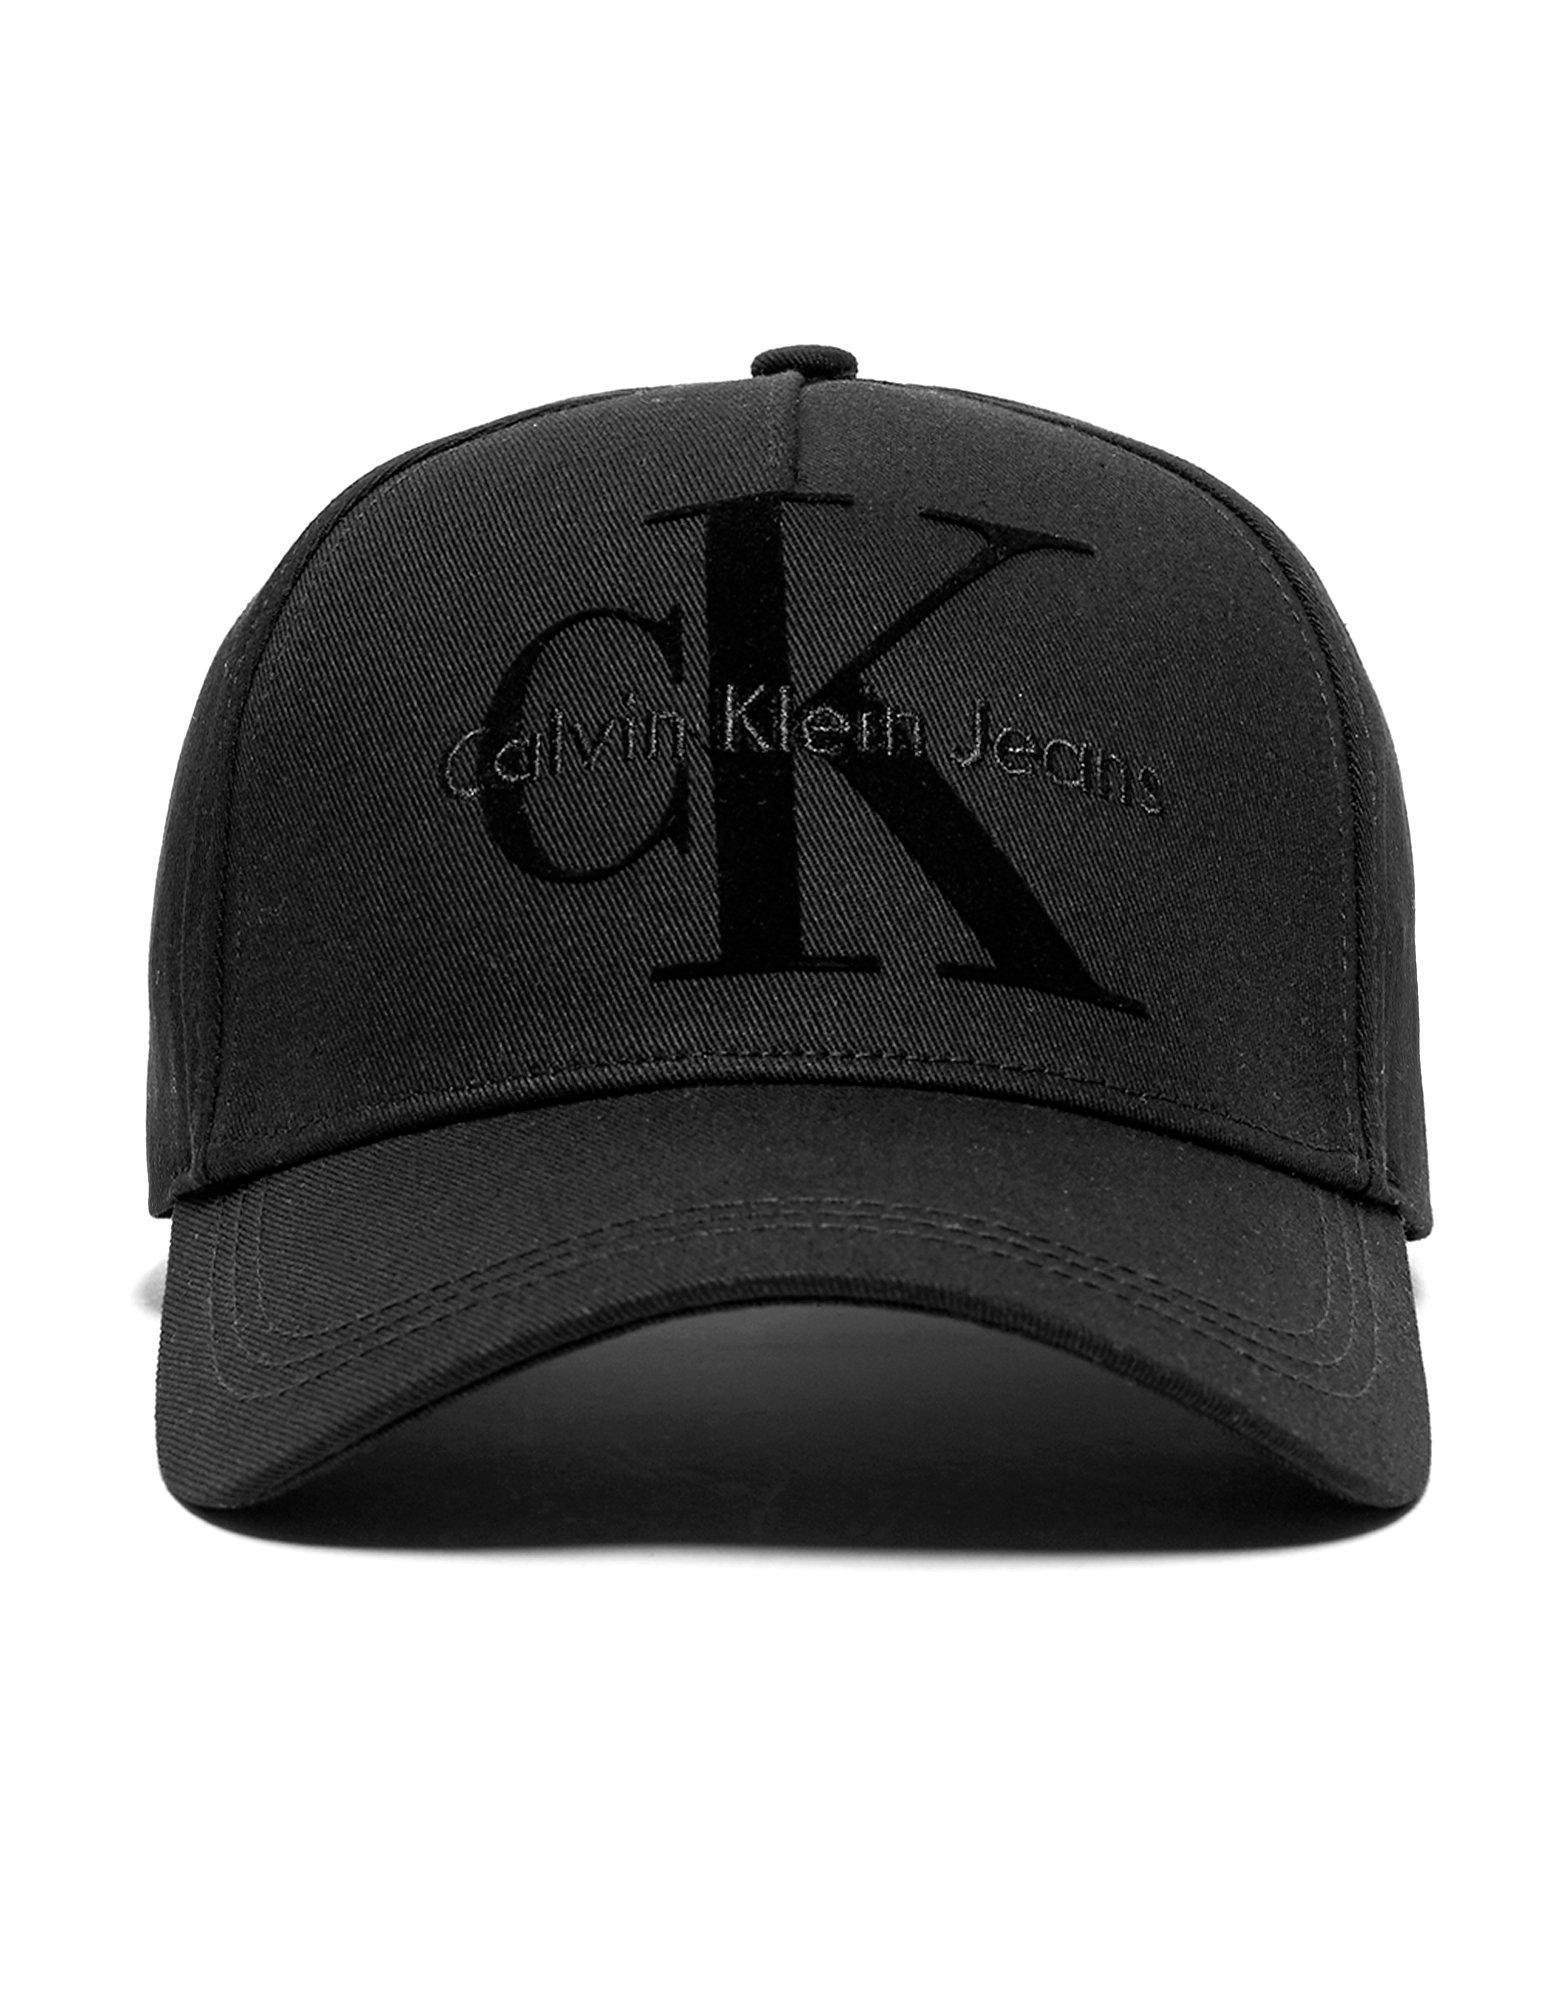 eb21bf51b Calvin Klein Re-issue Baseball Cap in Black for Men - Lyst